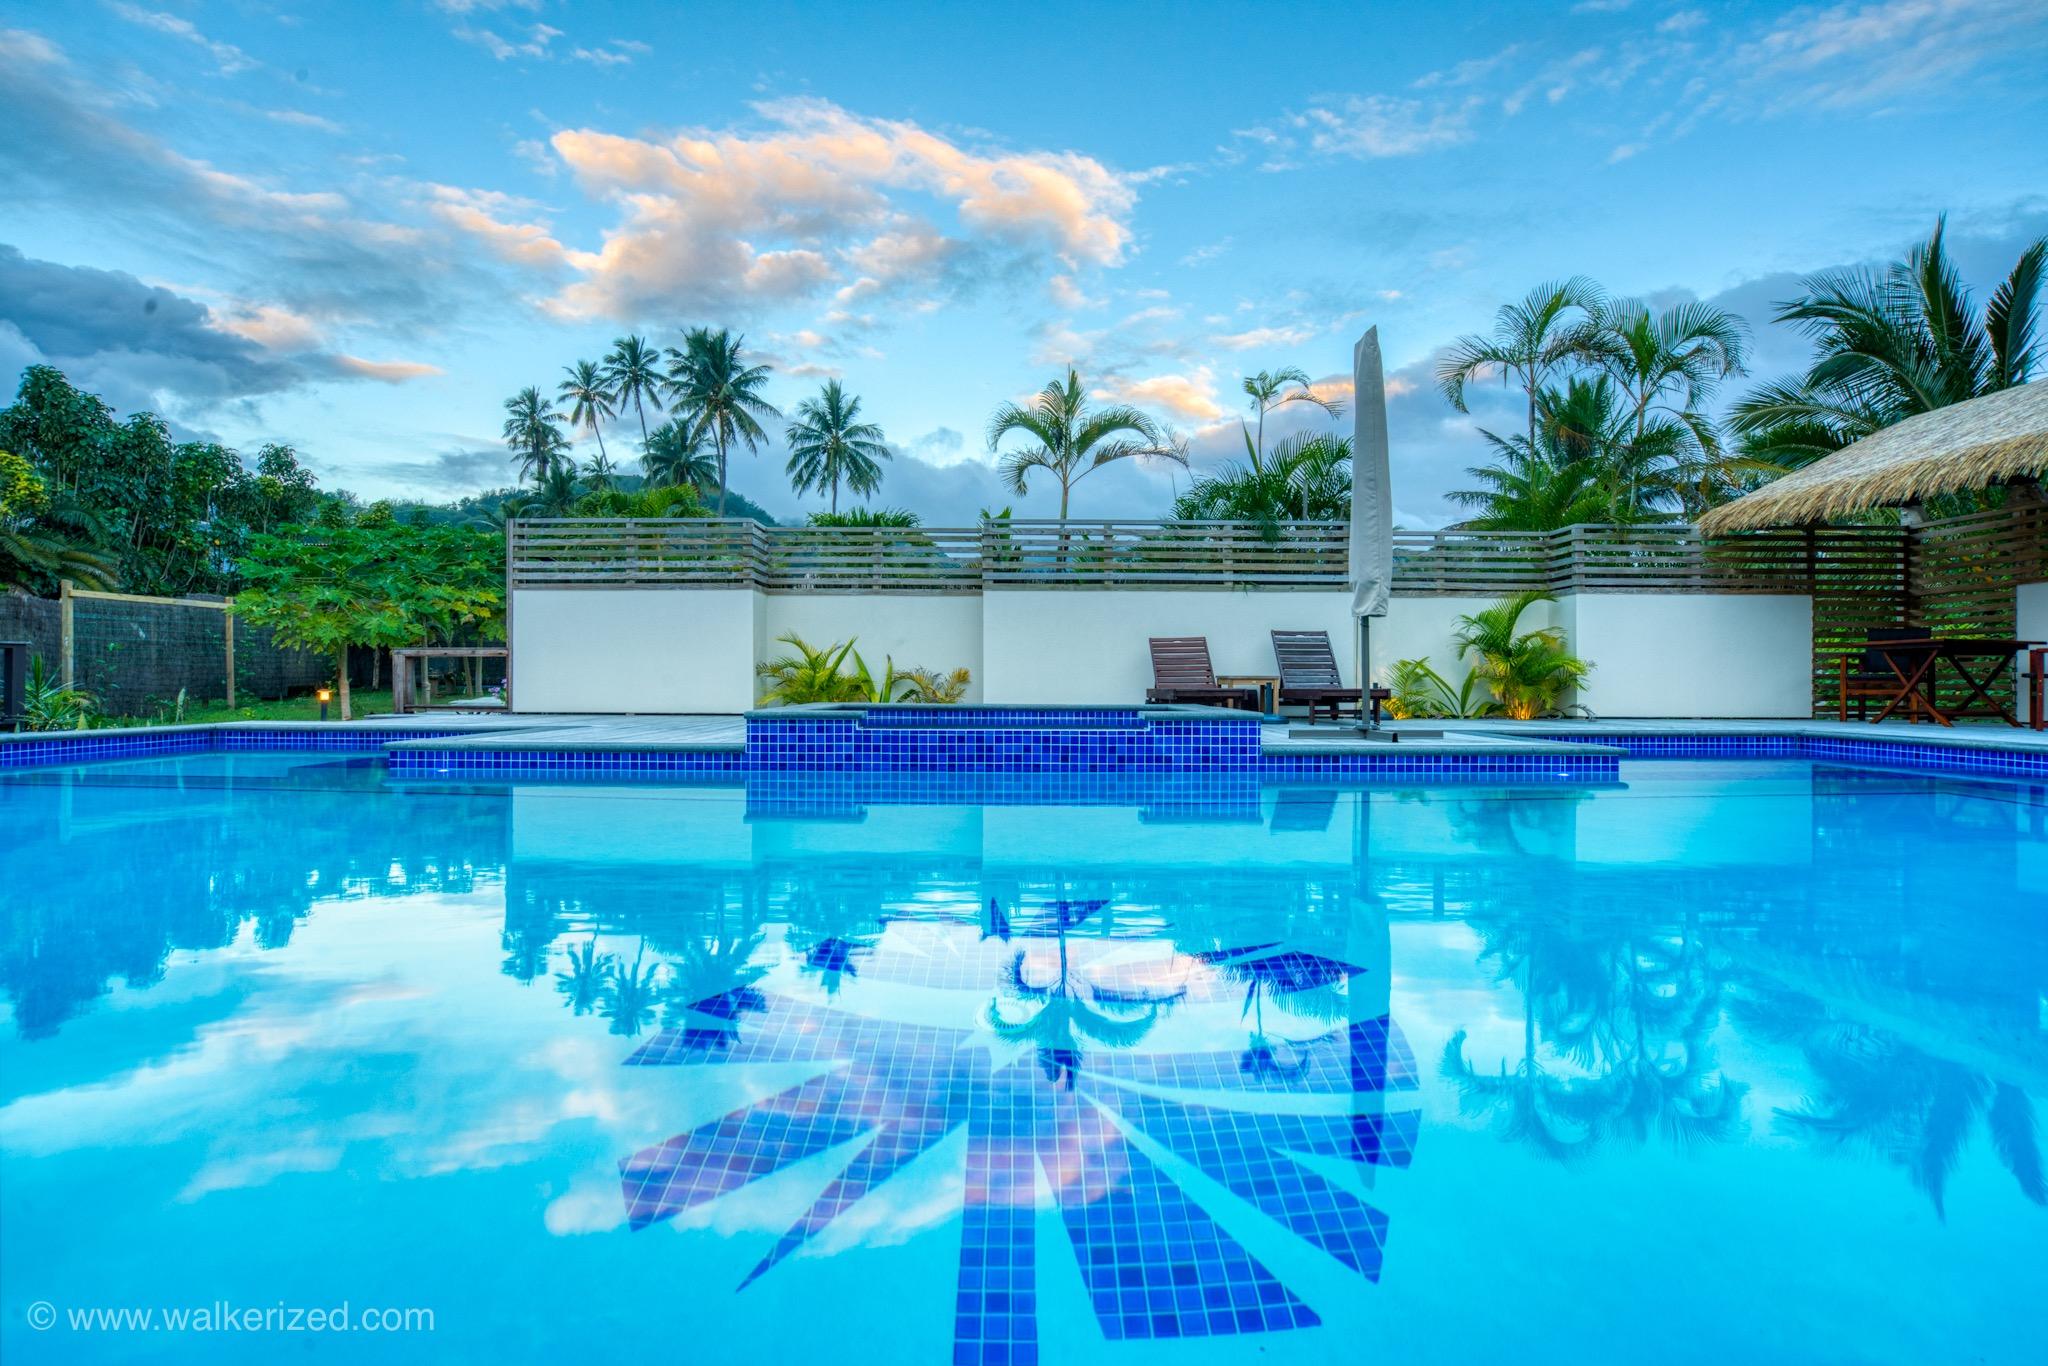 pool_reflection 3